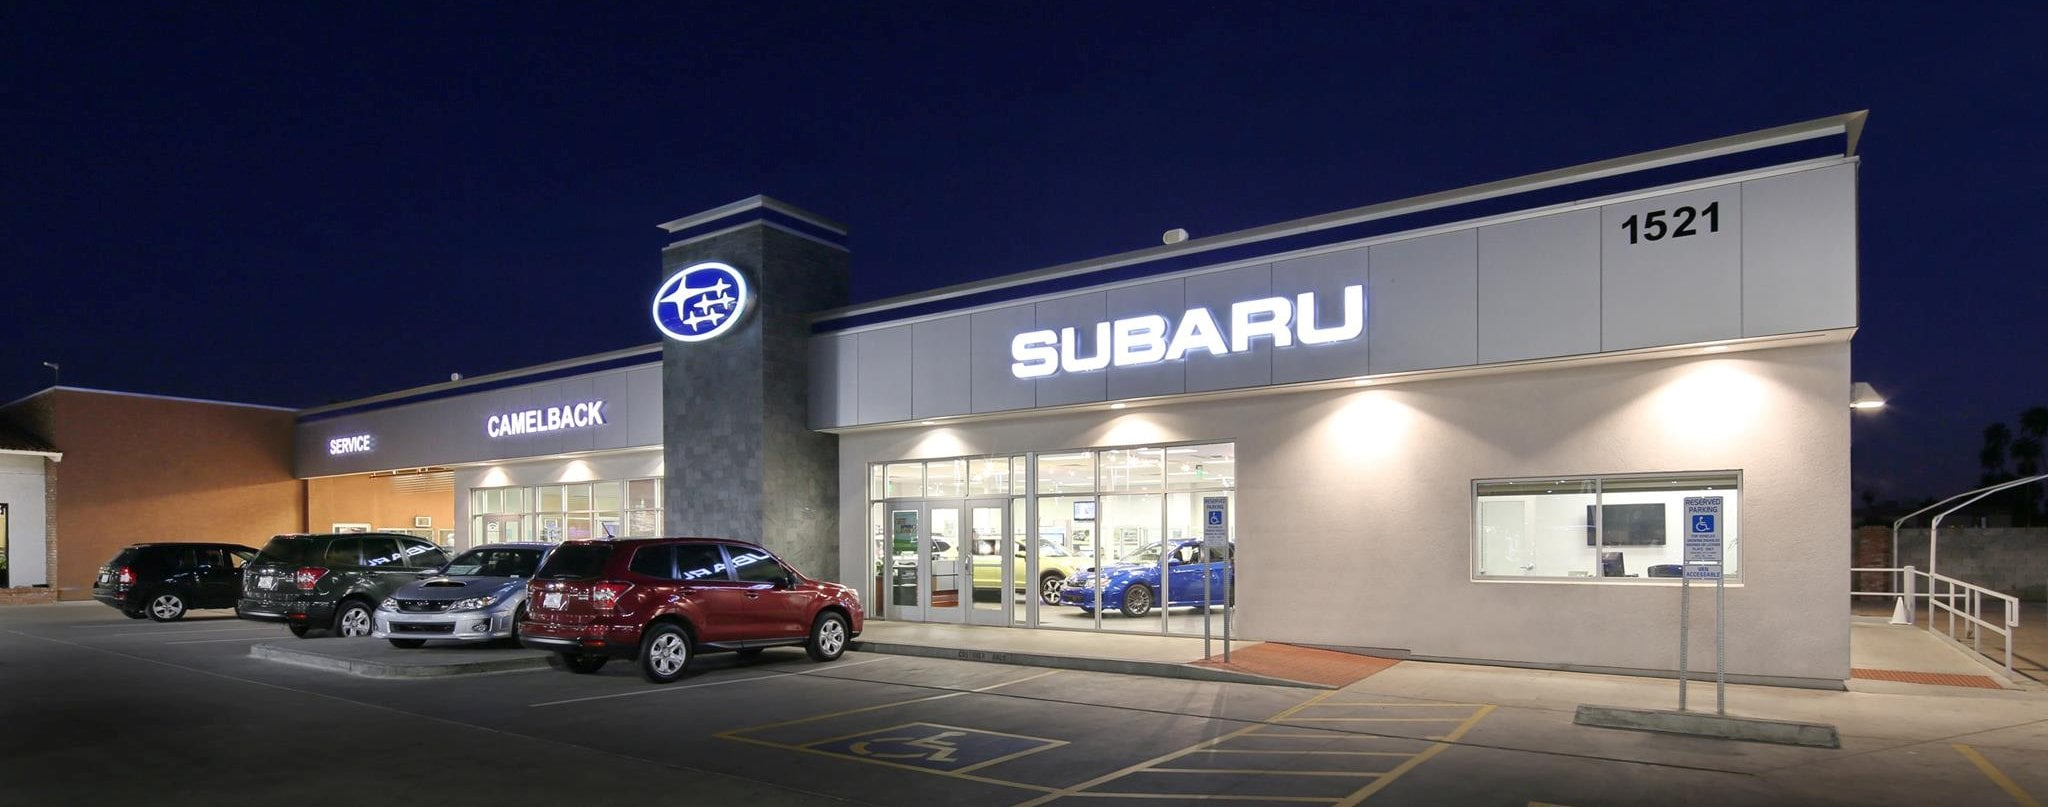 Camelback Subaru Dealer Subaru Finance Service In Phoenix